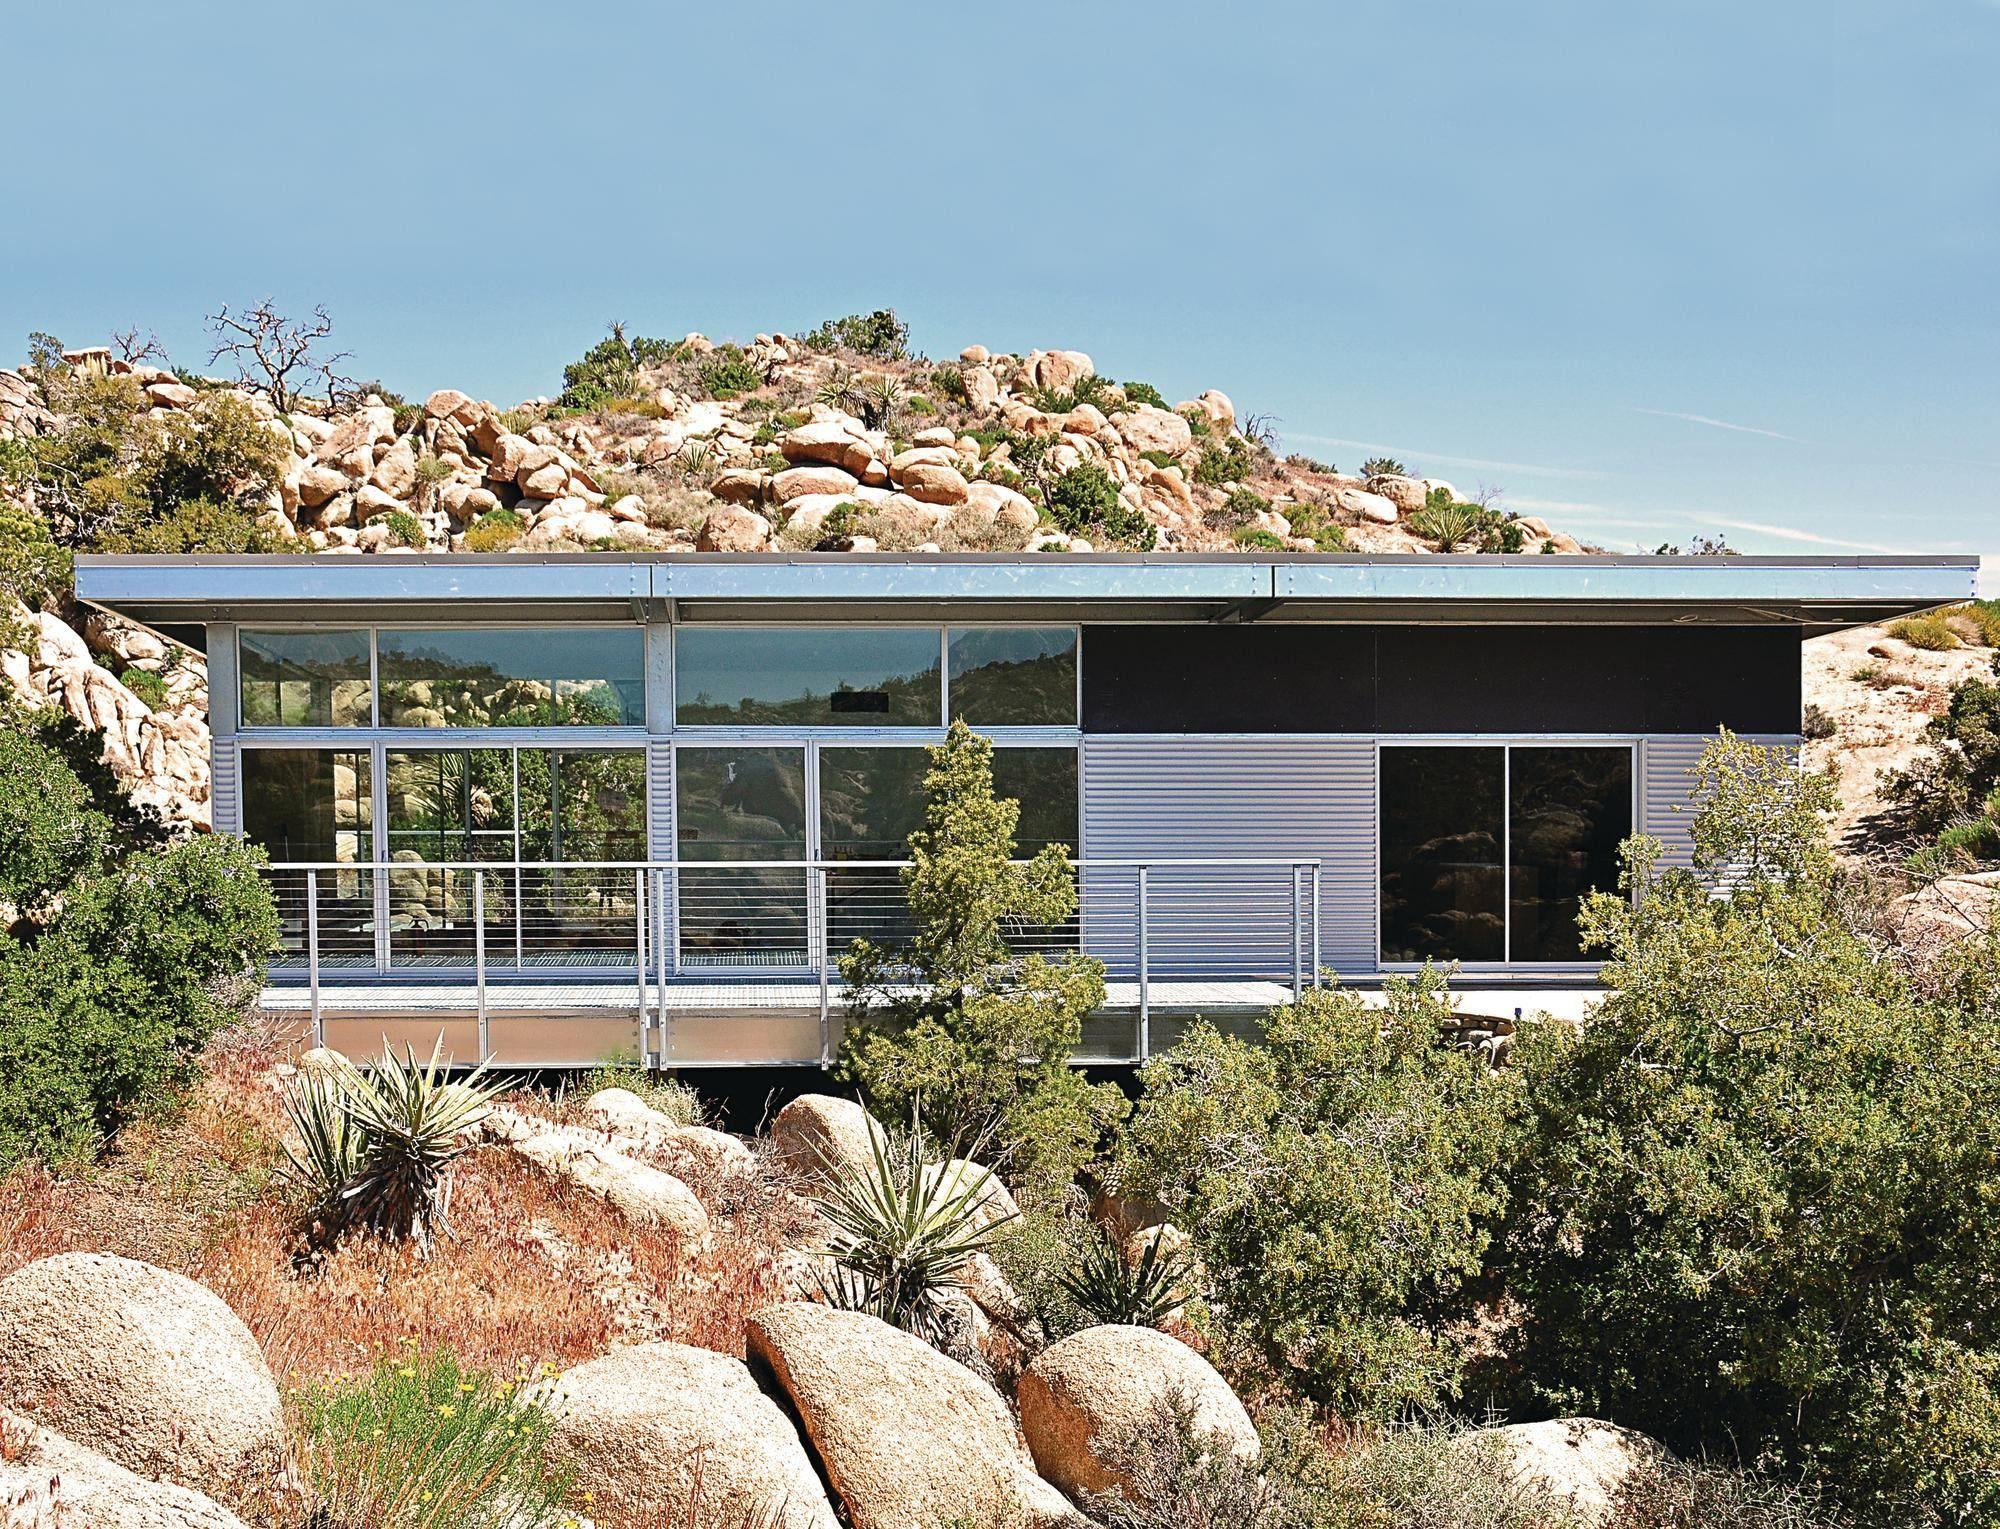 Elegantes wohndesign blue sky homes schließt elegantes stahlfertighaus ab  wohndesign